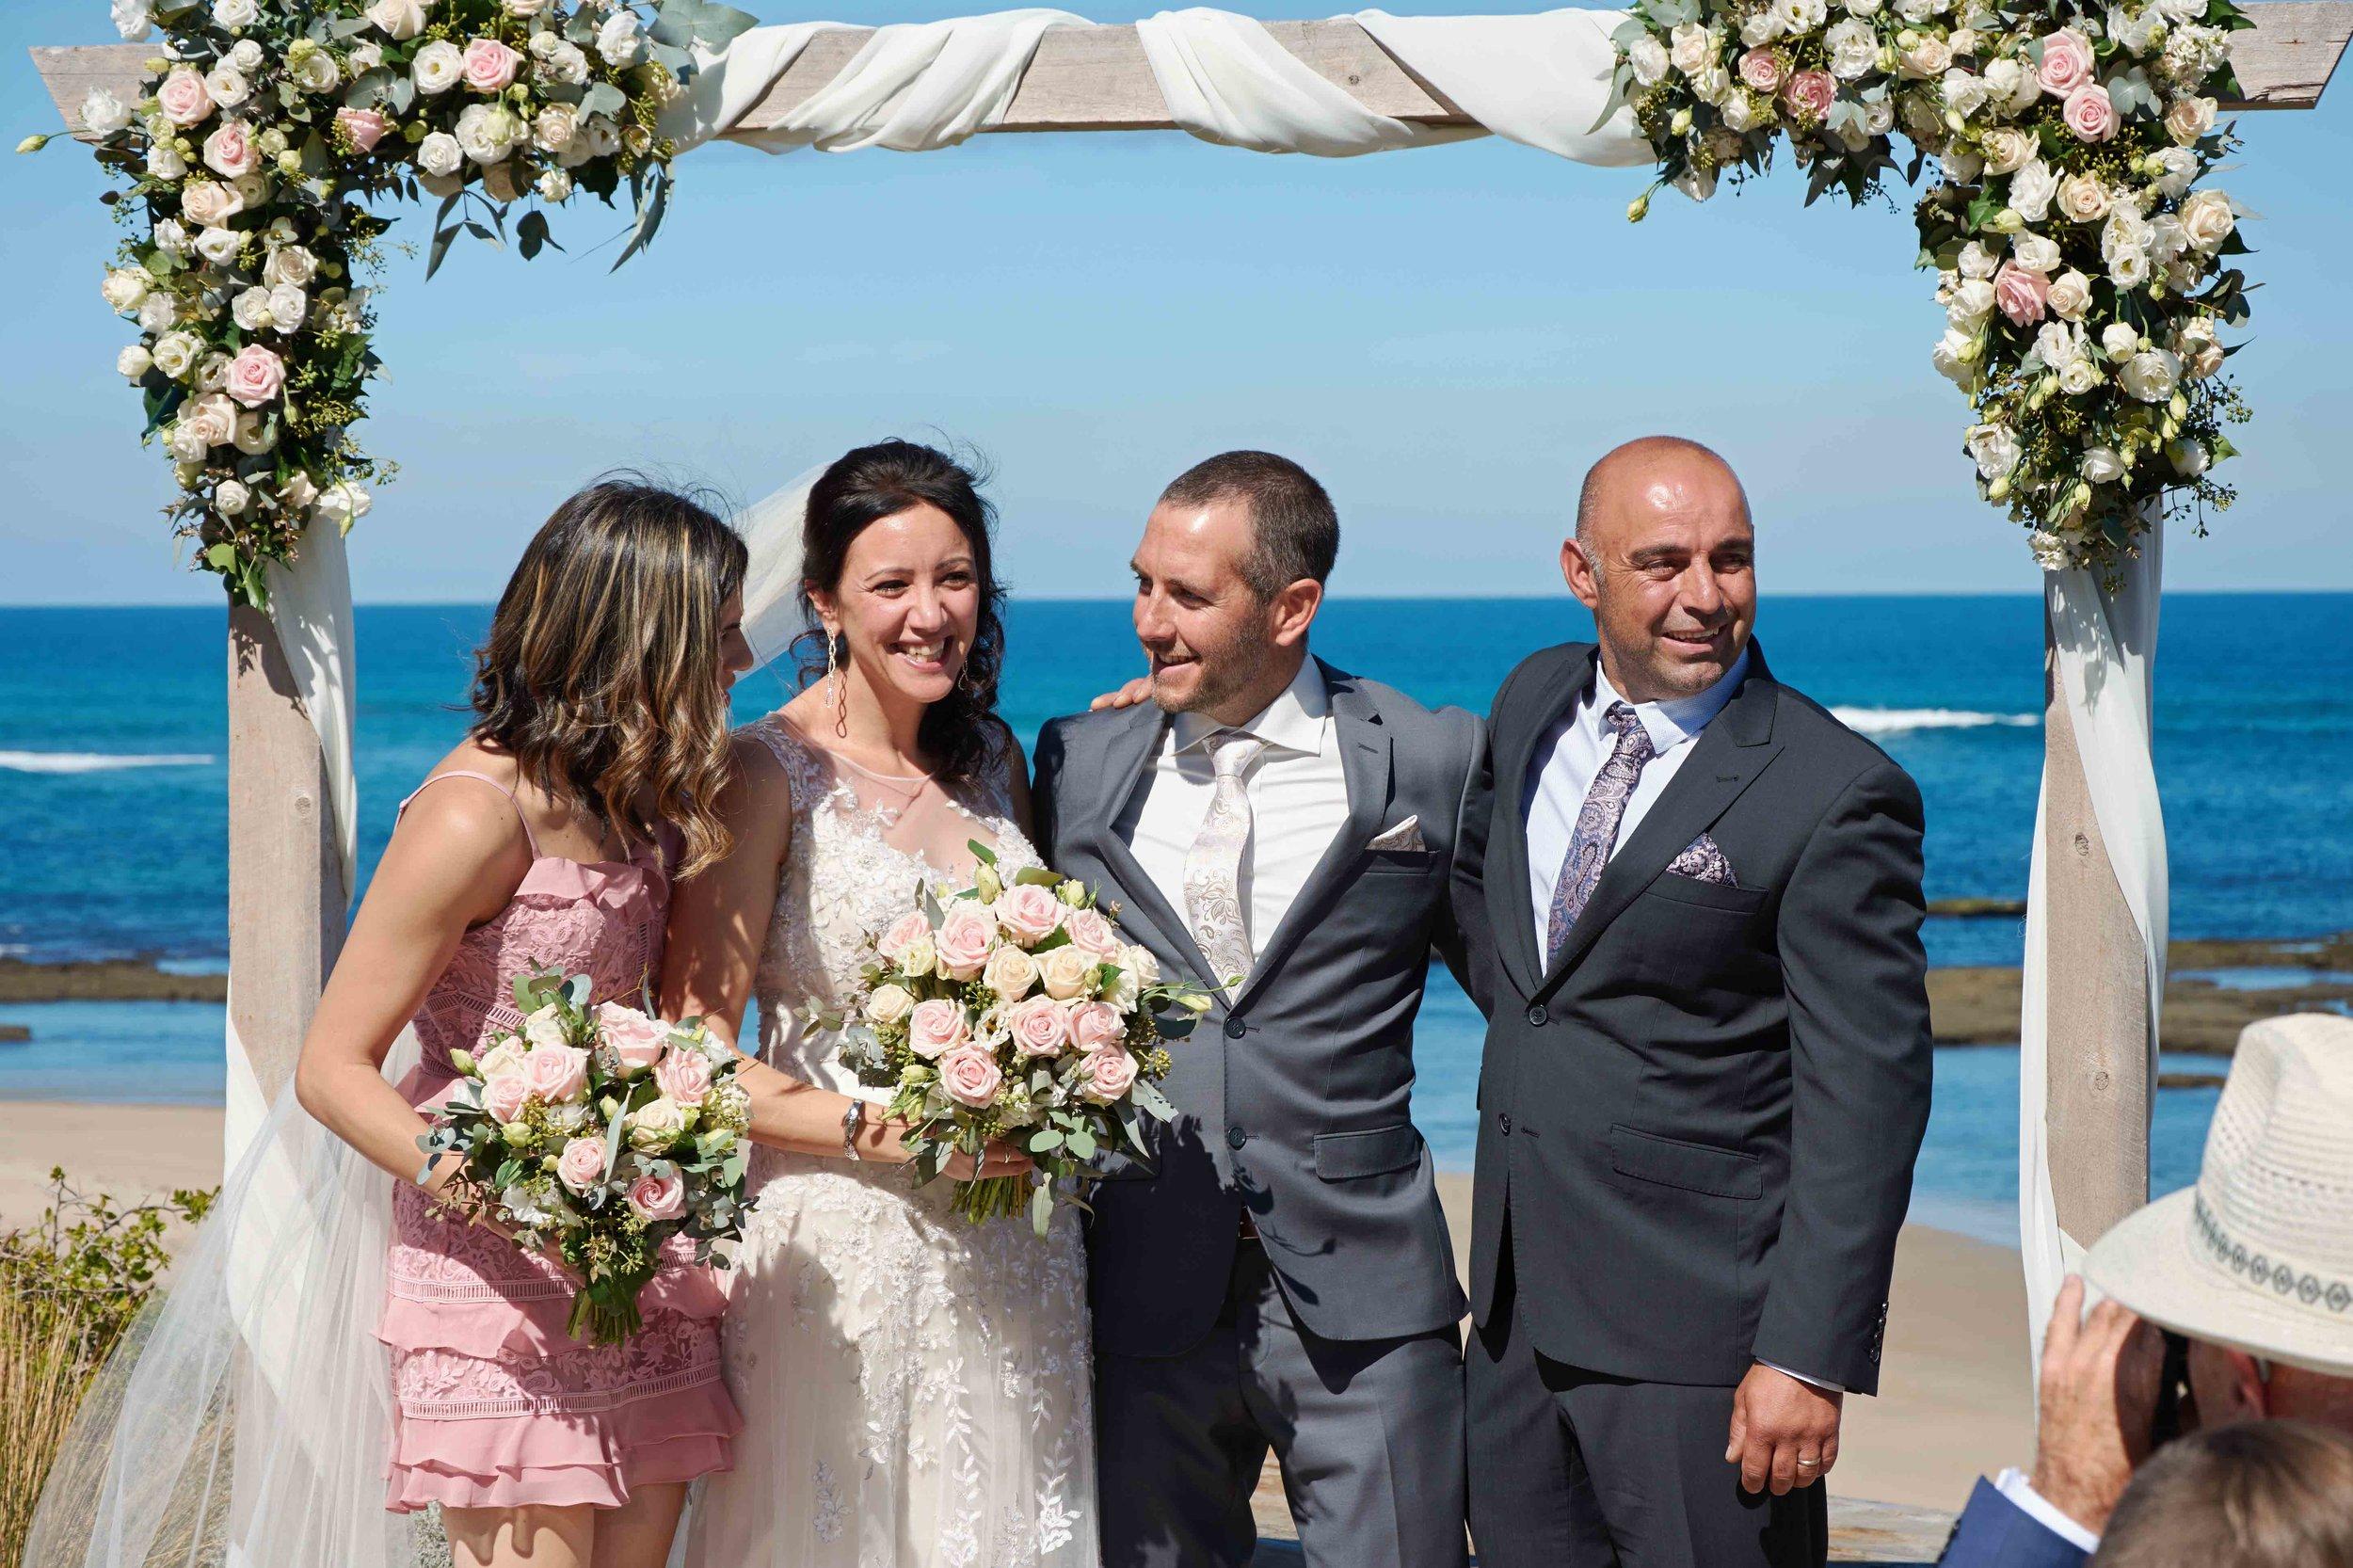 sorrento-wedding-photography-all-smiles-marissa-jade-photography-59.jpg